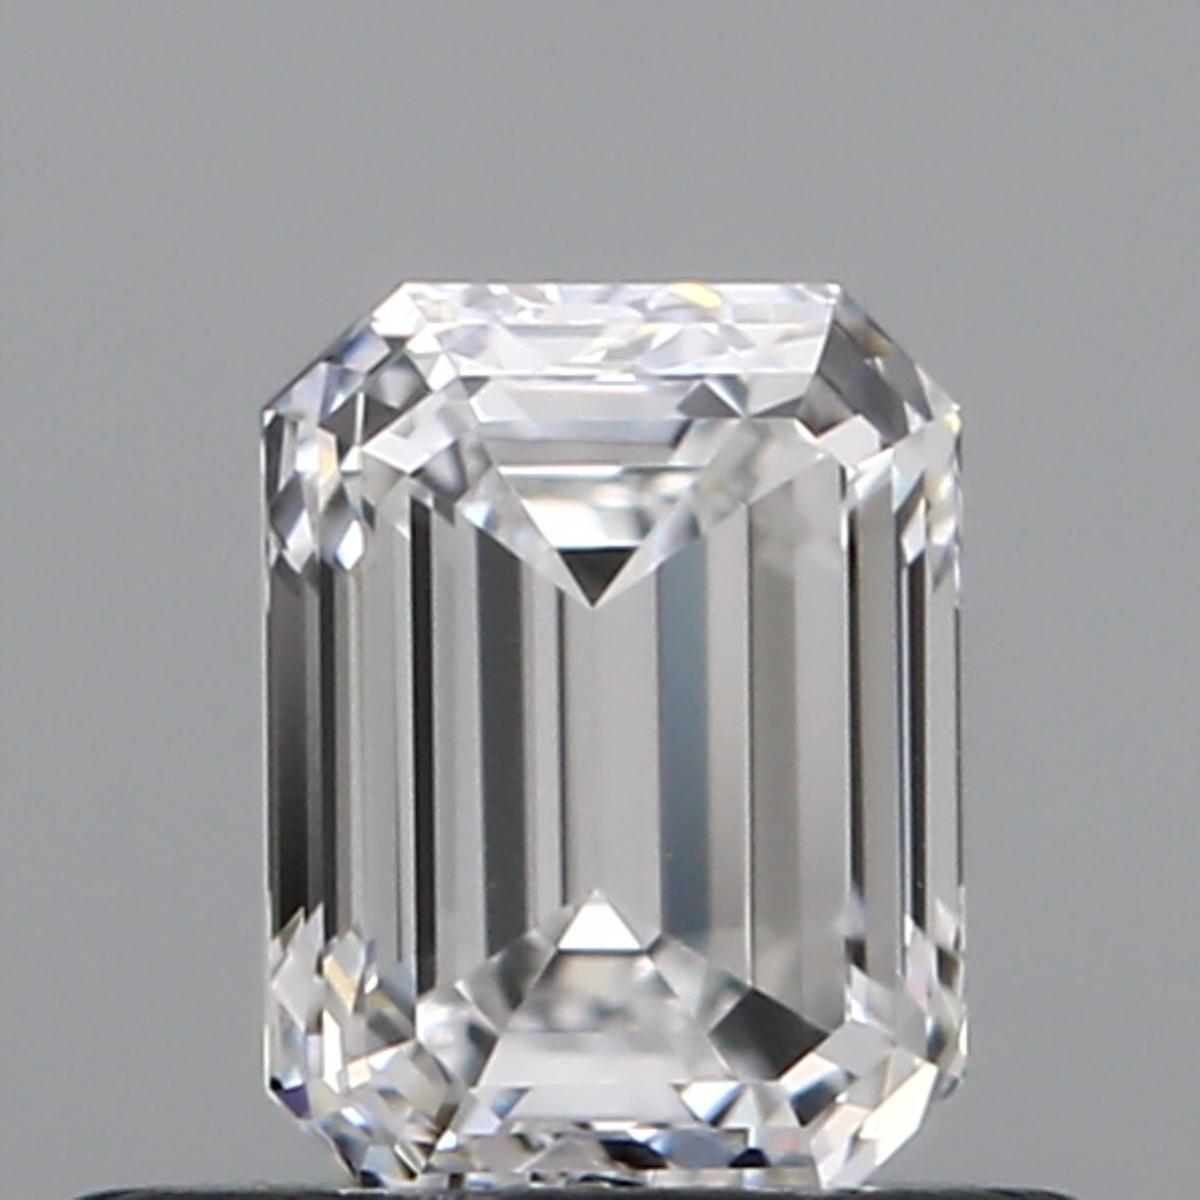 0.50 ct Emerald Cut Diamond : E / VVS1